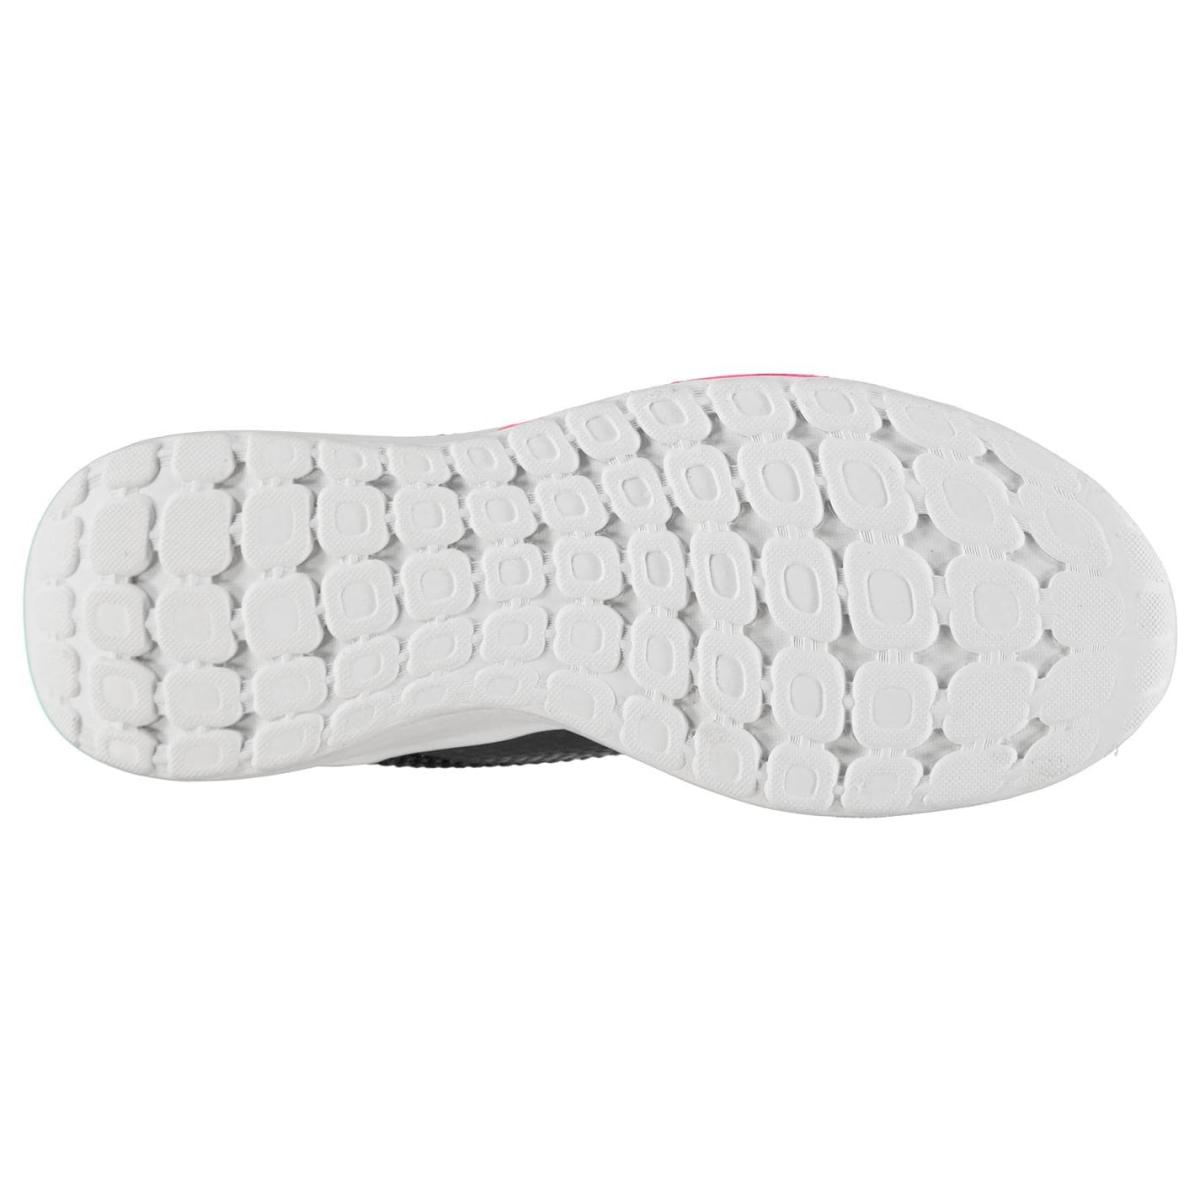 adidas-Puremotion-Turnschuhe-Damen-Sneaker-Sportschuhe-Laufschuhe-1562 Indexbild 3